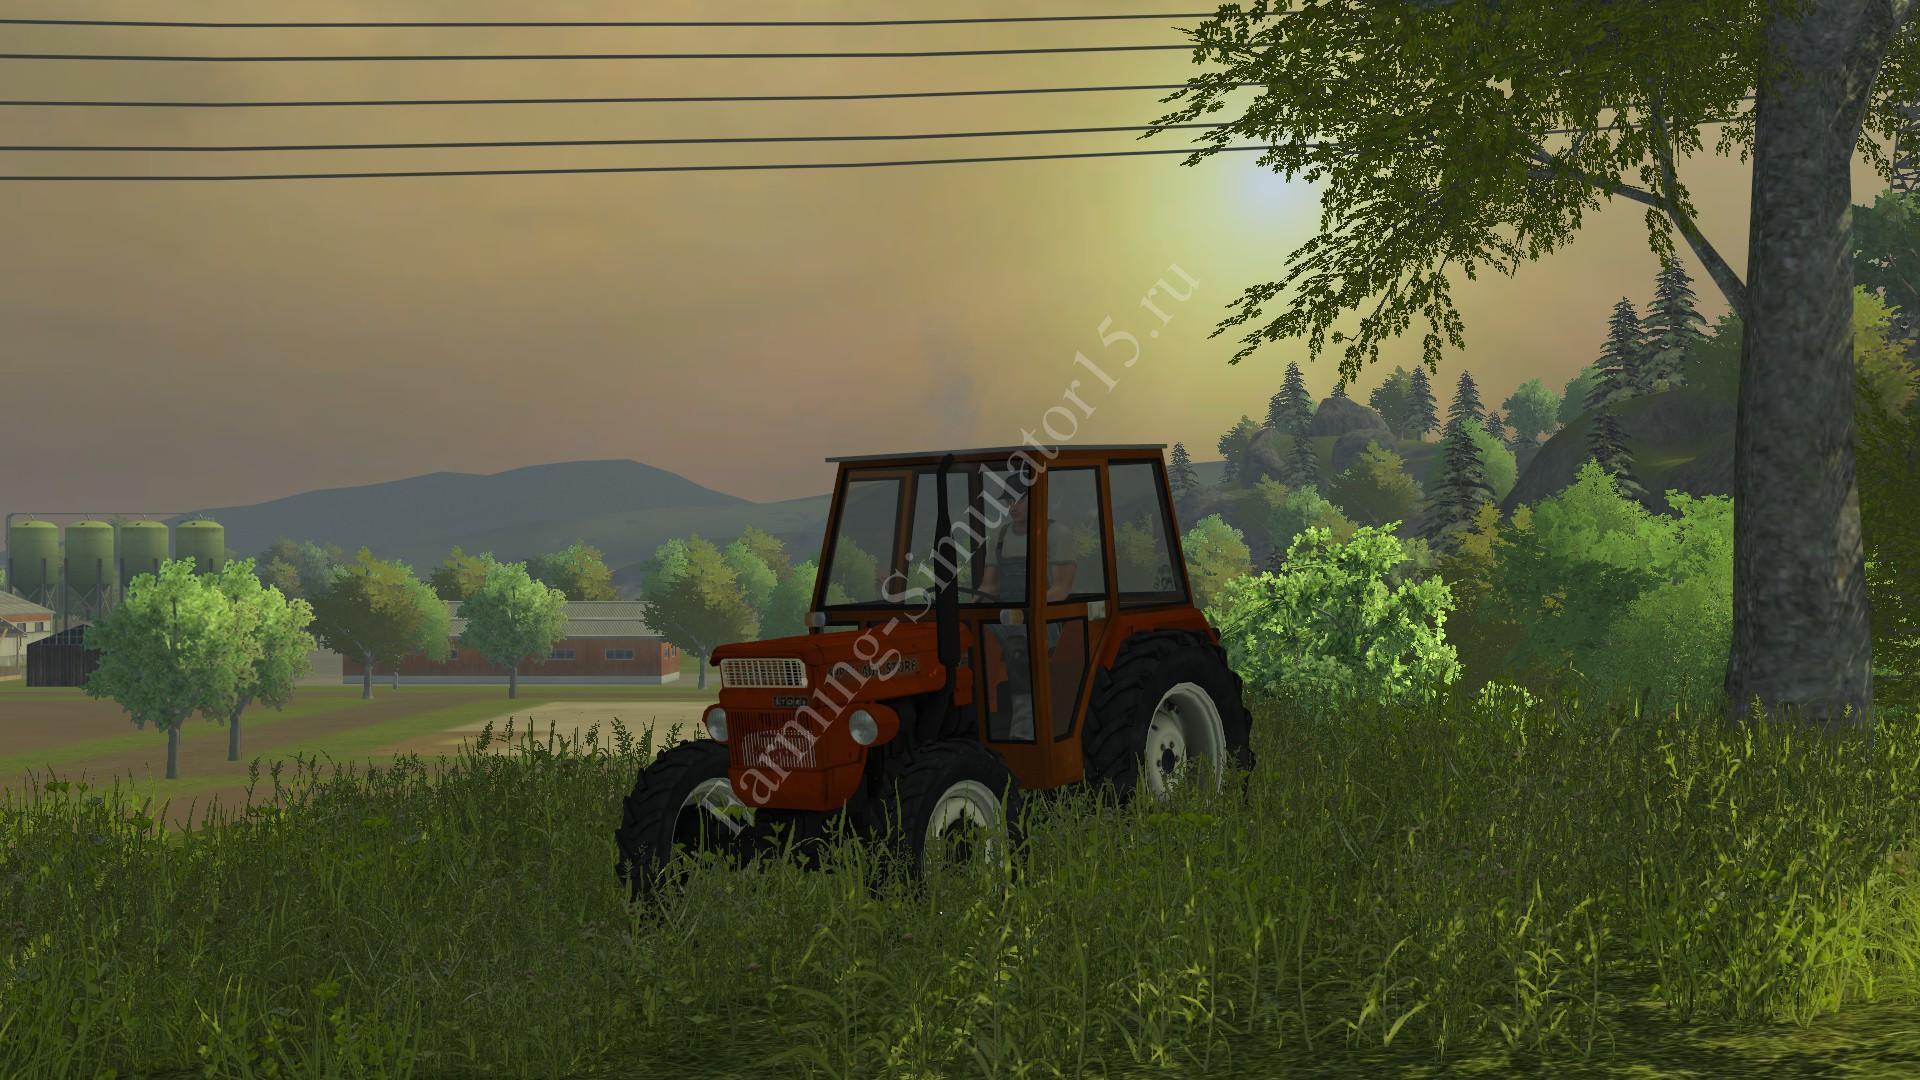 Мод трактора Store 404 Super v 1.0 Farming Simulator 2013, Farming Simulator 13